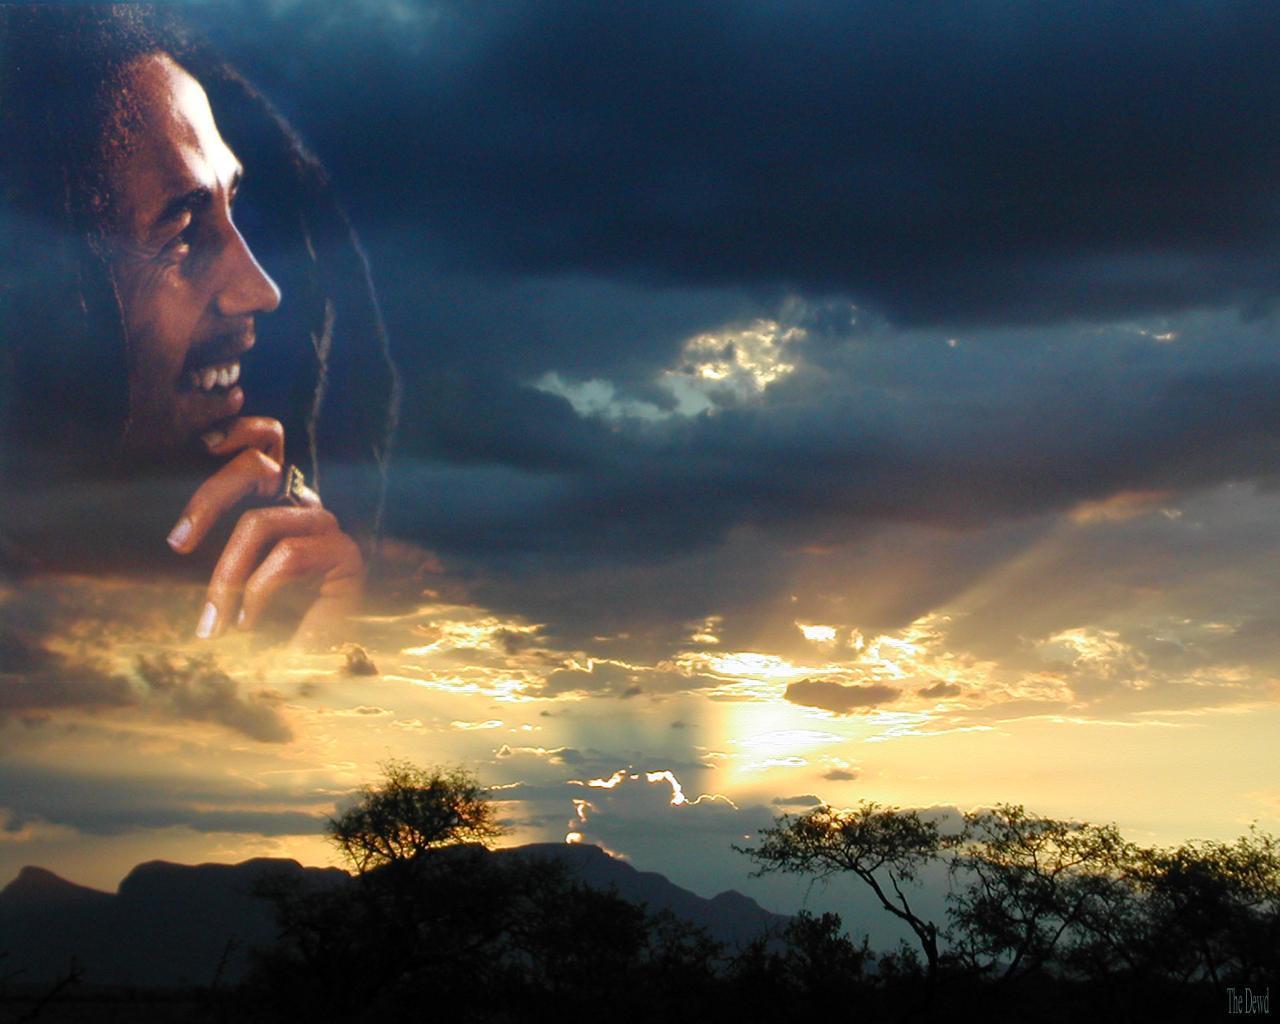 100 Fondos y Imagenes Rastas, Reggae, Bob Marley [+ yapa]